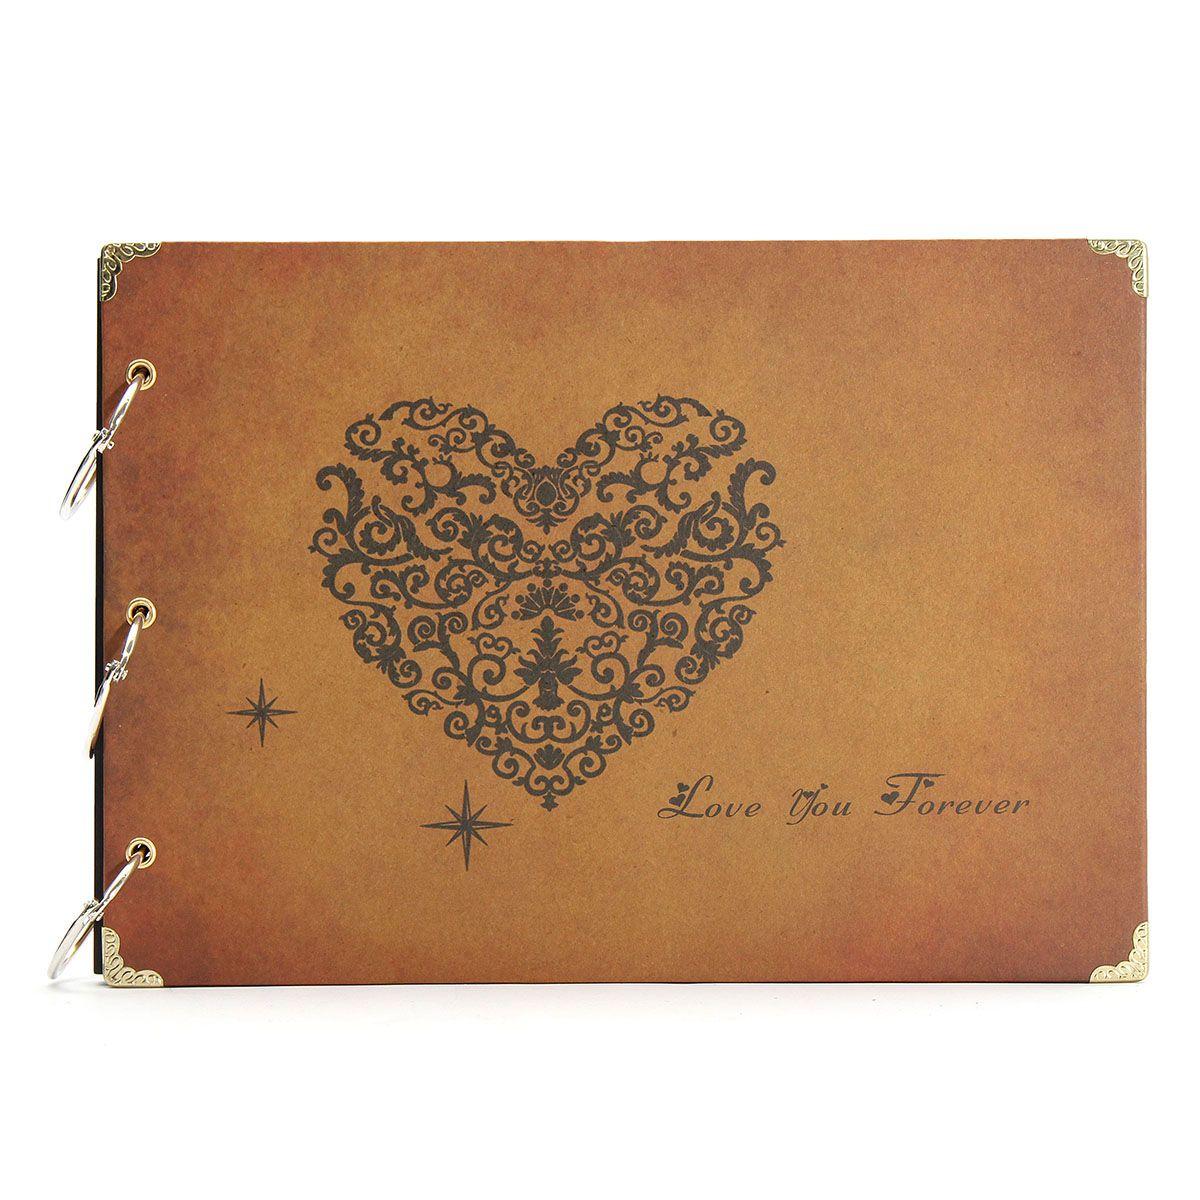 Diy handmade vintage stamping wedding photo album eternal memory